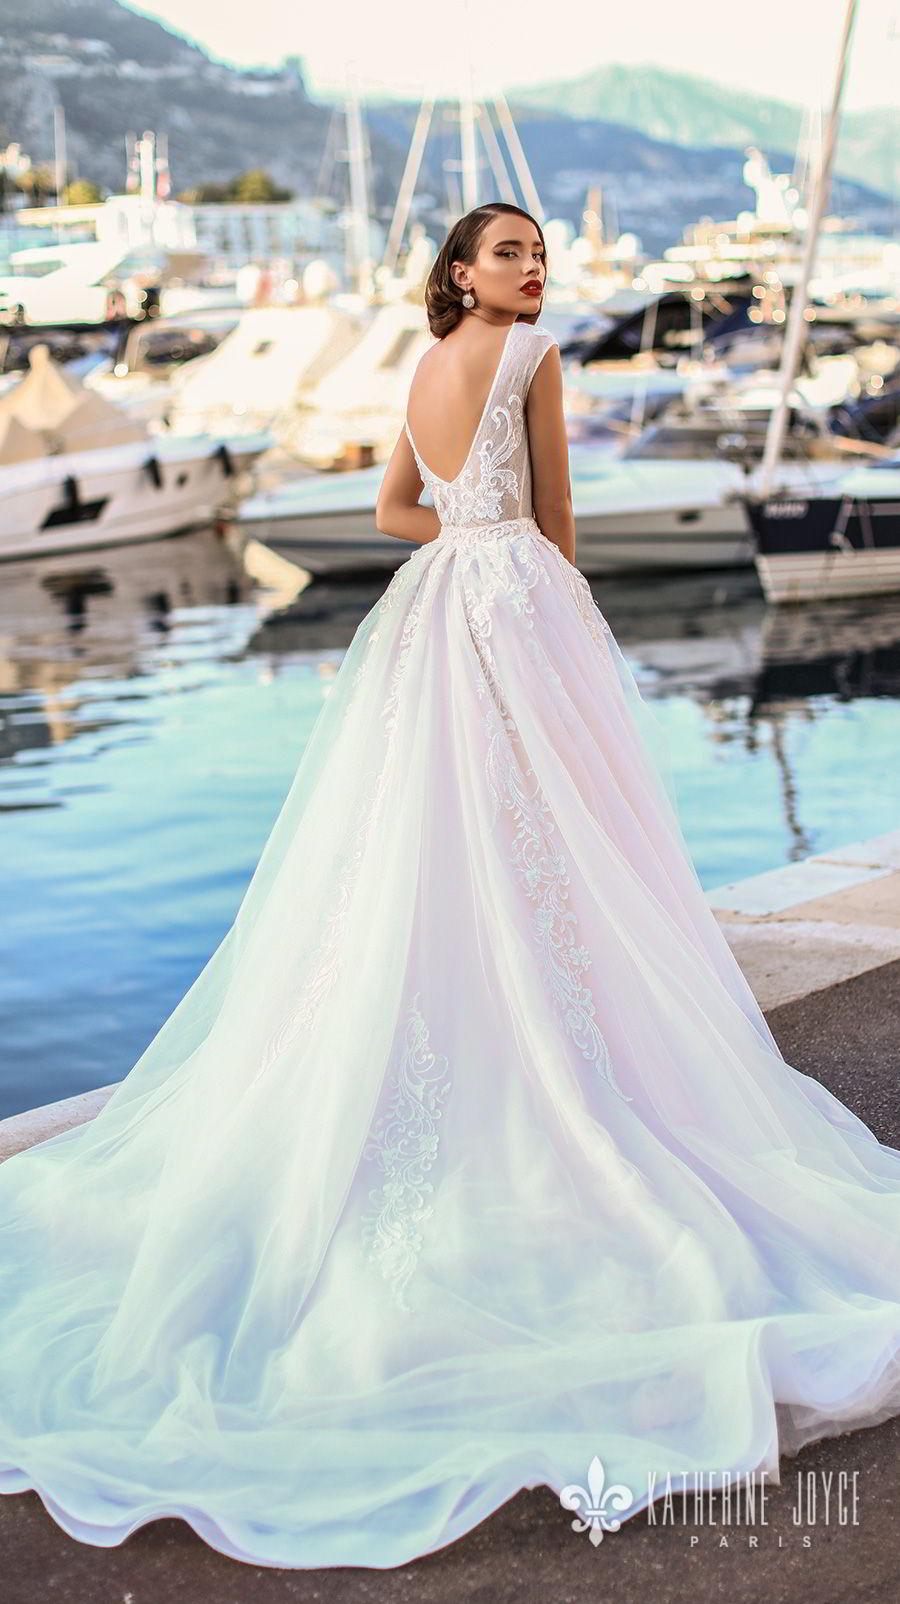 katherine joyce 2018 bridal sleeveless jewel neck heavily embellished bodice romantic ball gown a  line wedding dress scoop back chapel train (mari) bv